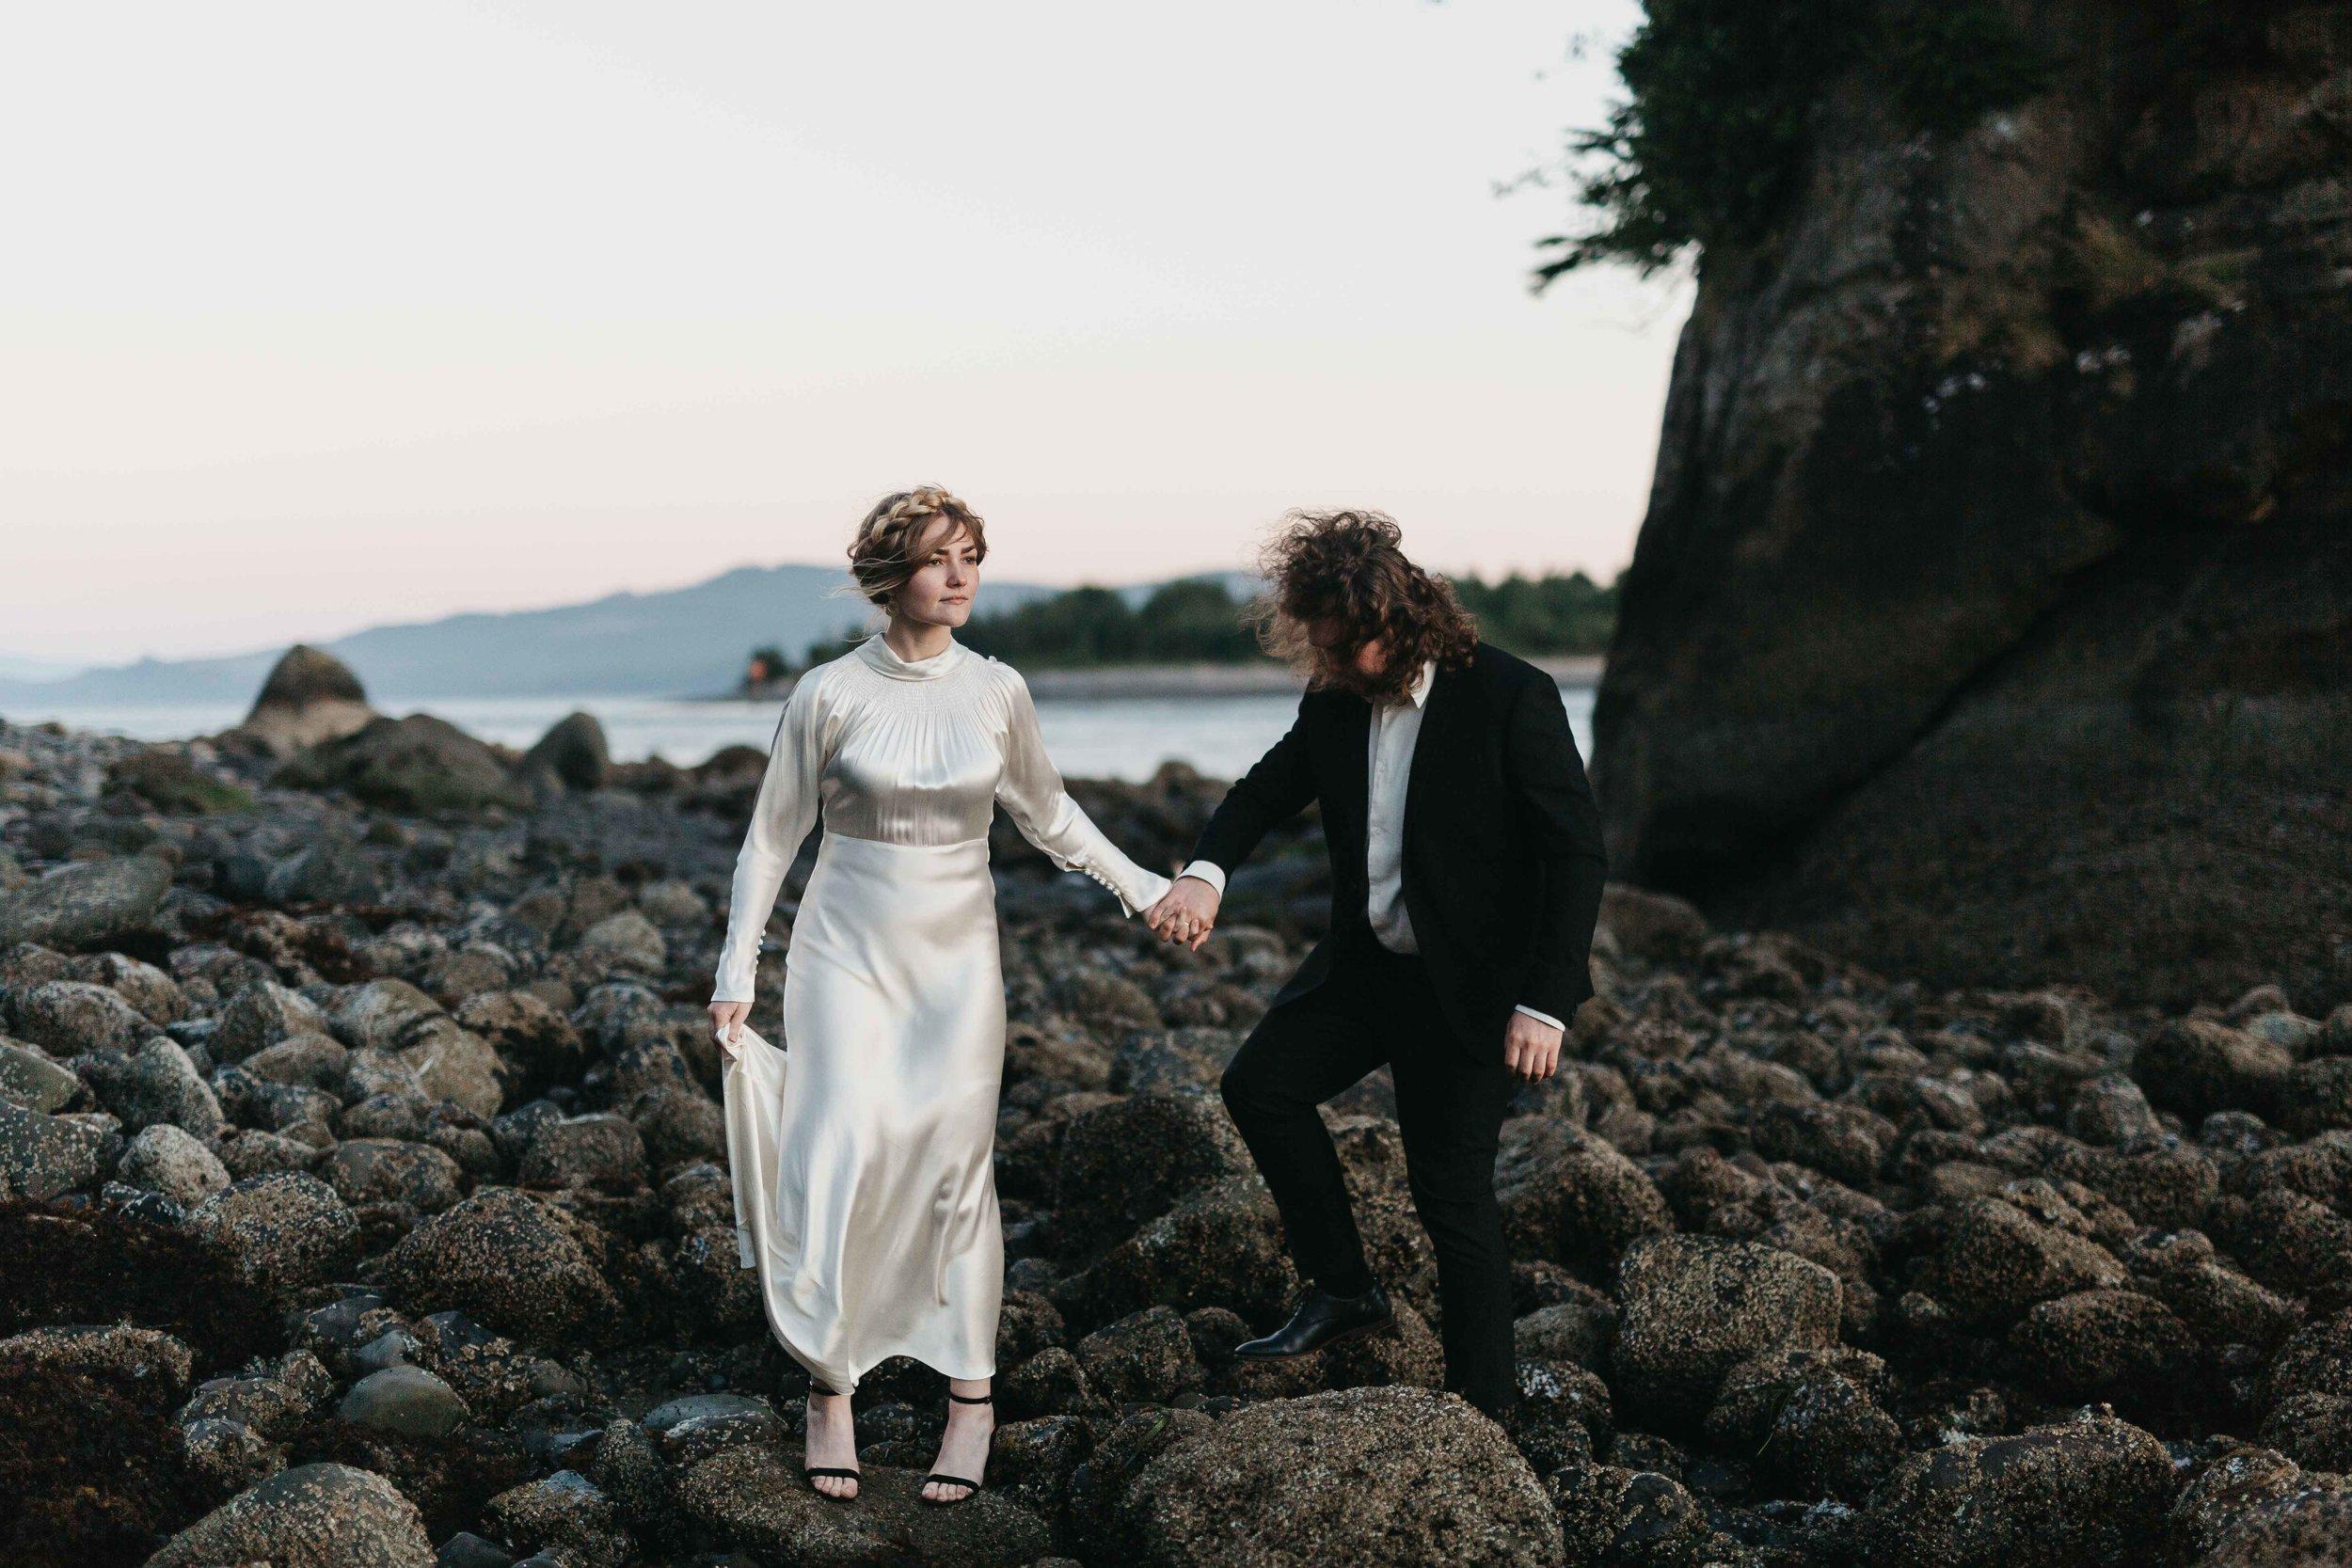 Oregon-Wedding-Photographer-12.jpg